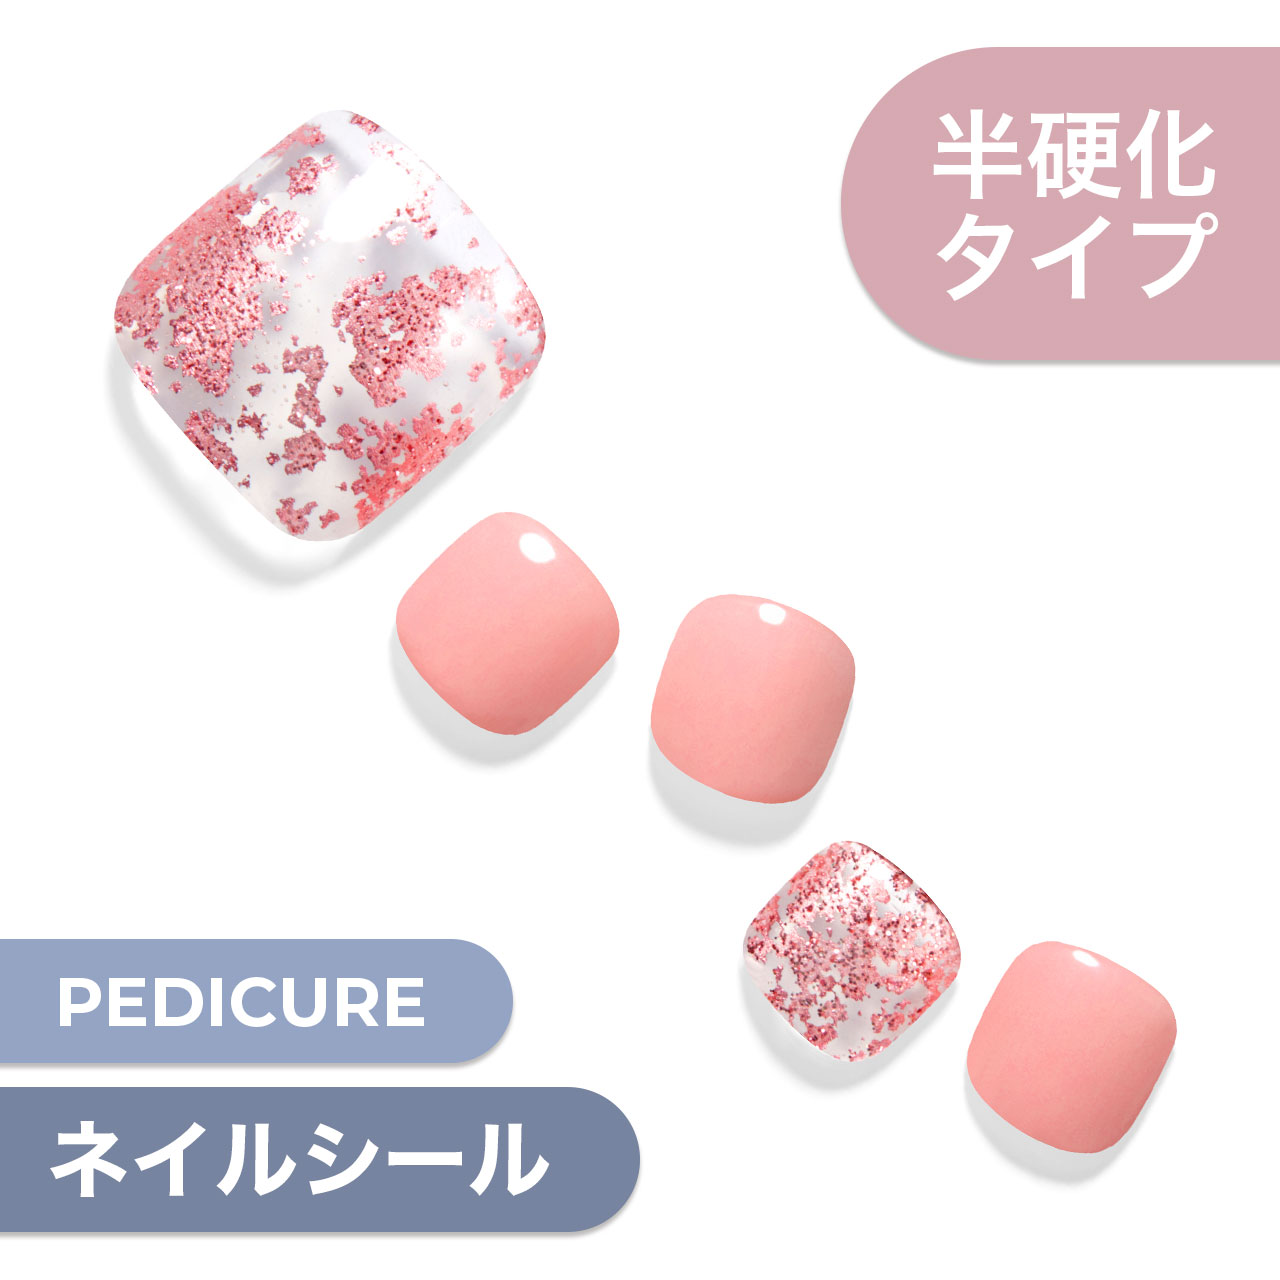 【Rosy Flakes】ダッシングディバグレーズ ペディ